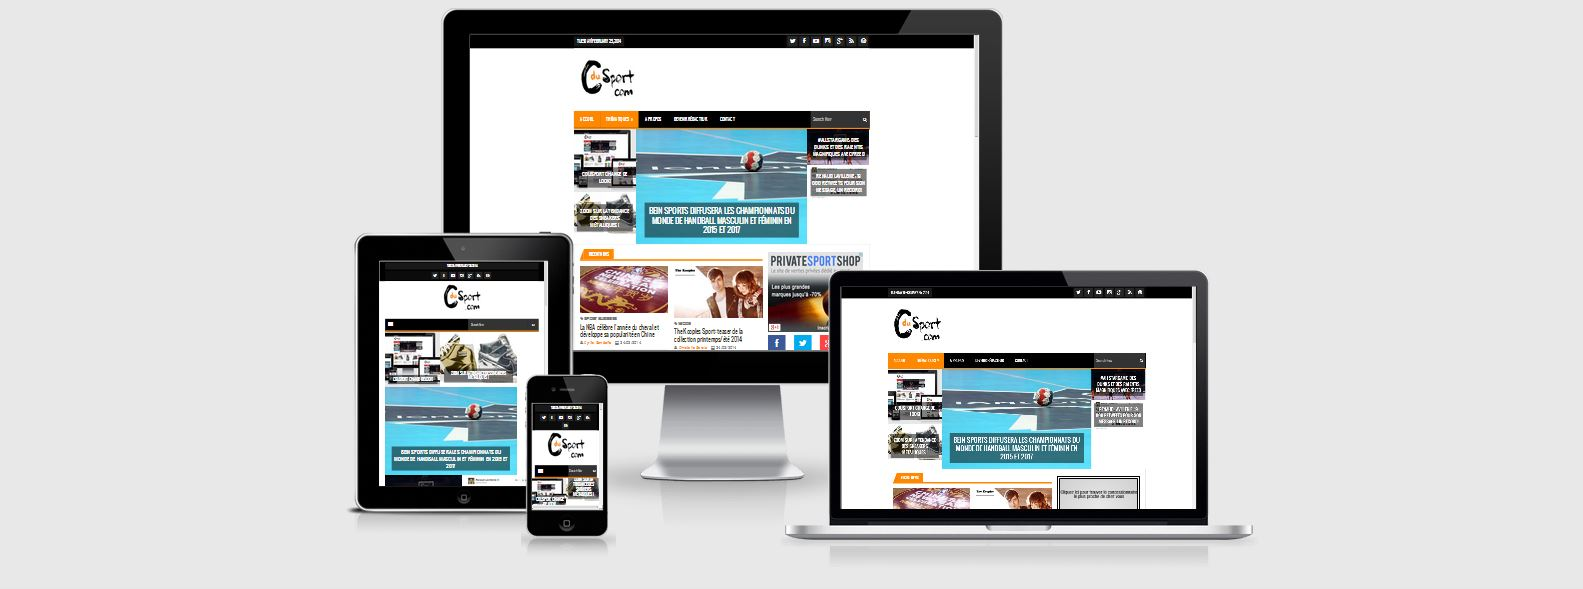 cdusport-responsive-site